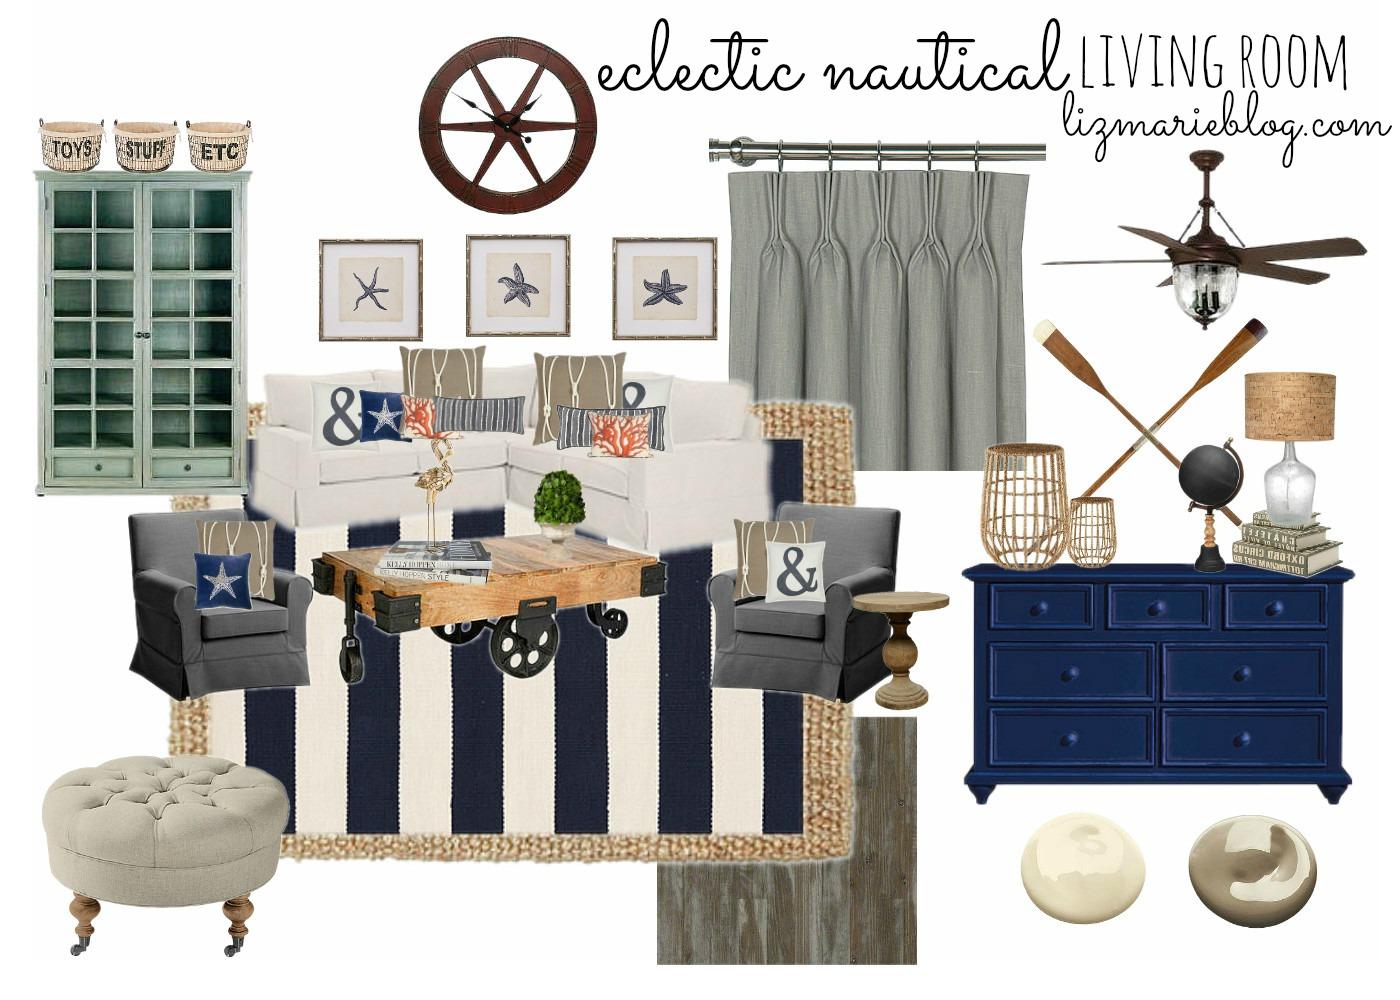 Eclectic Nautical Living Room Liz Marie Blog